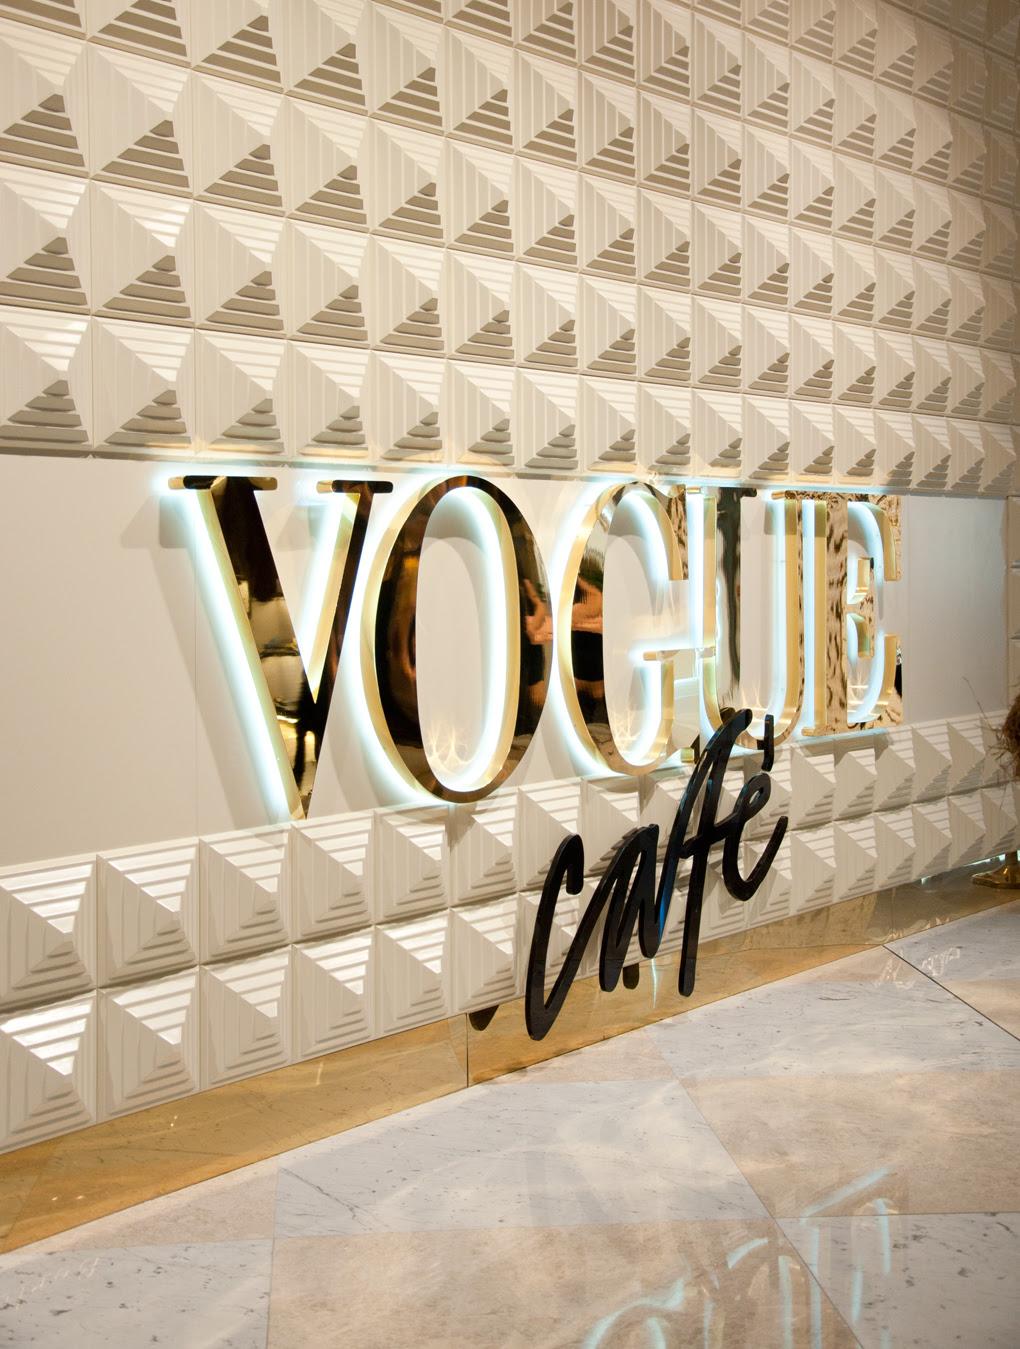 http://www.lylalovesfashion.com/wp-content/uploads/2013/10/Lyla_Loves_Fashion_vogue_cafe_dubai_reviewSC_0948.jpg